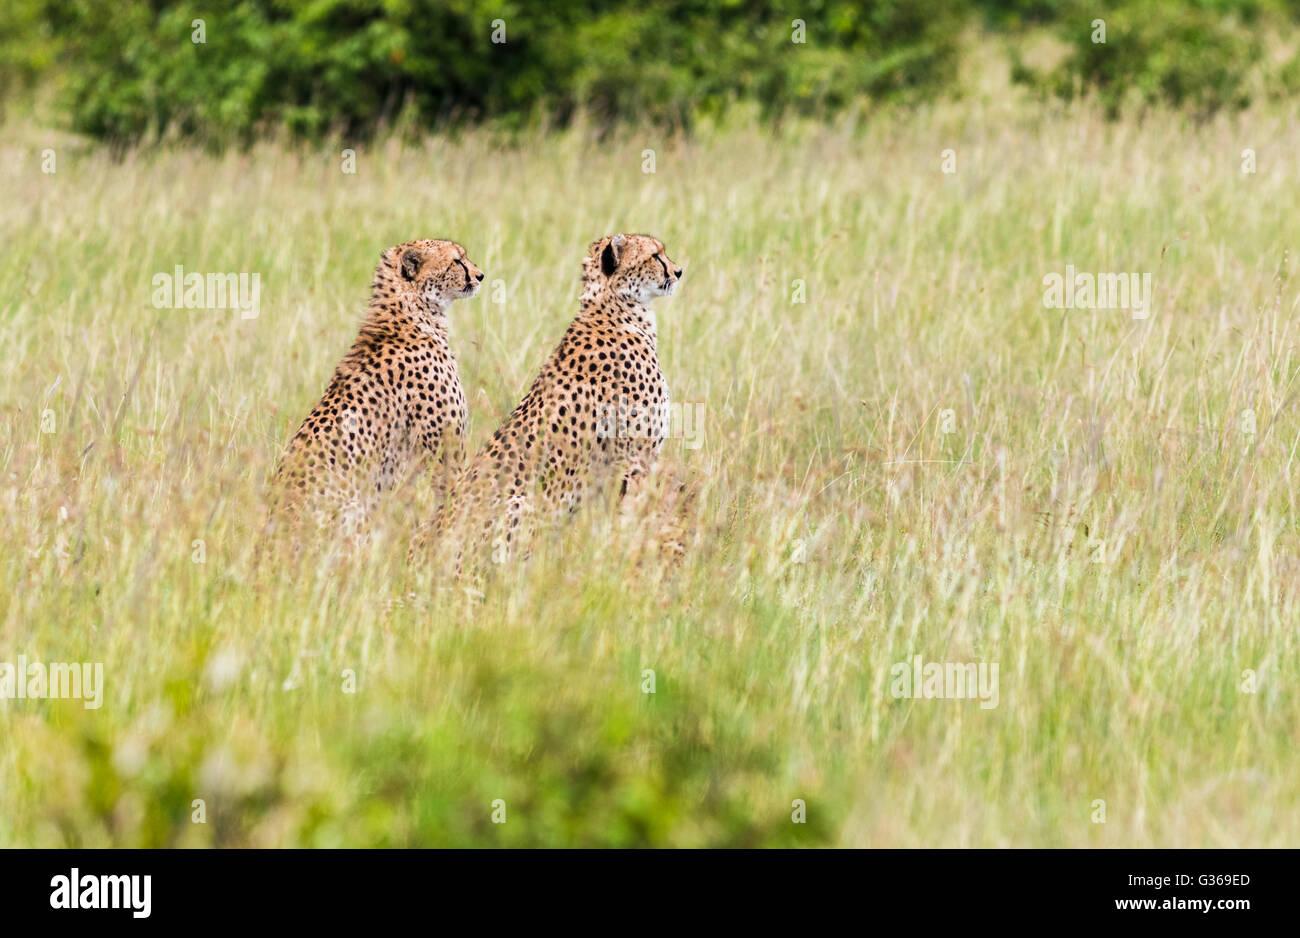 Two cheetahs in Masai Mara sitting in the the grass looking at something, Masai Mara, Kenya , Africa Stock Photo